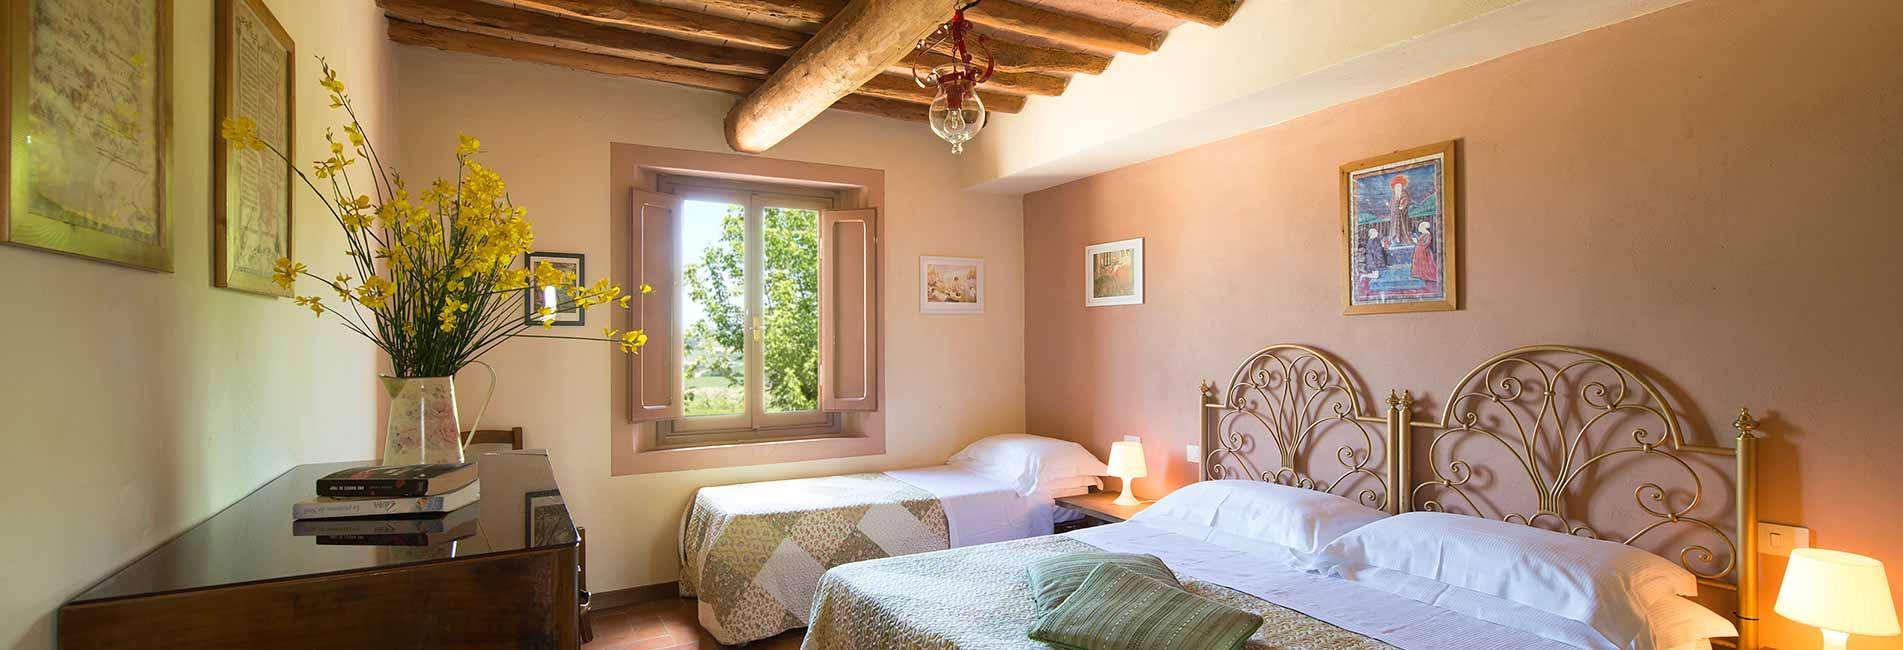 borgo_filicardo_apartments_chianti_tuscany5